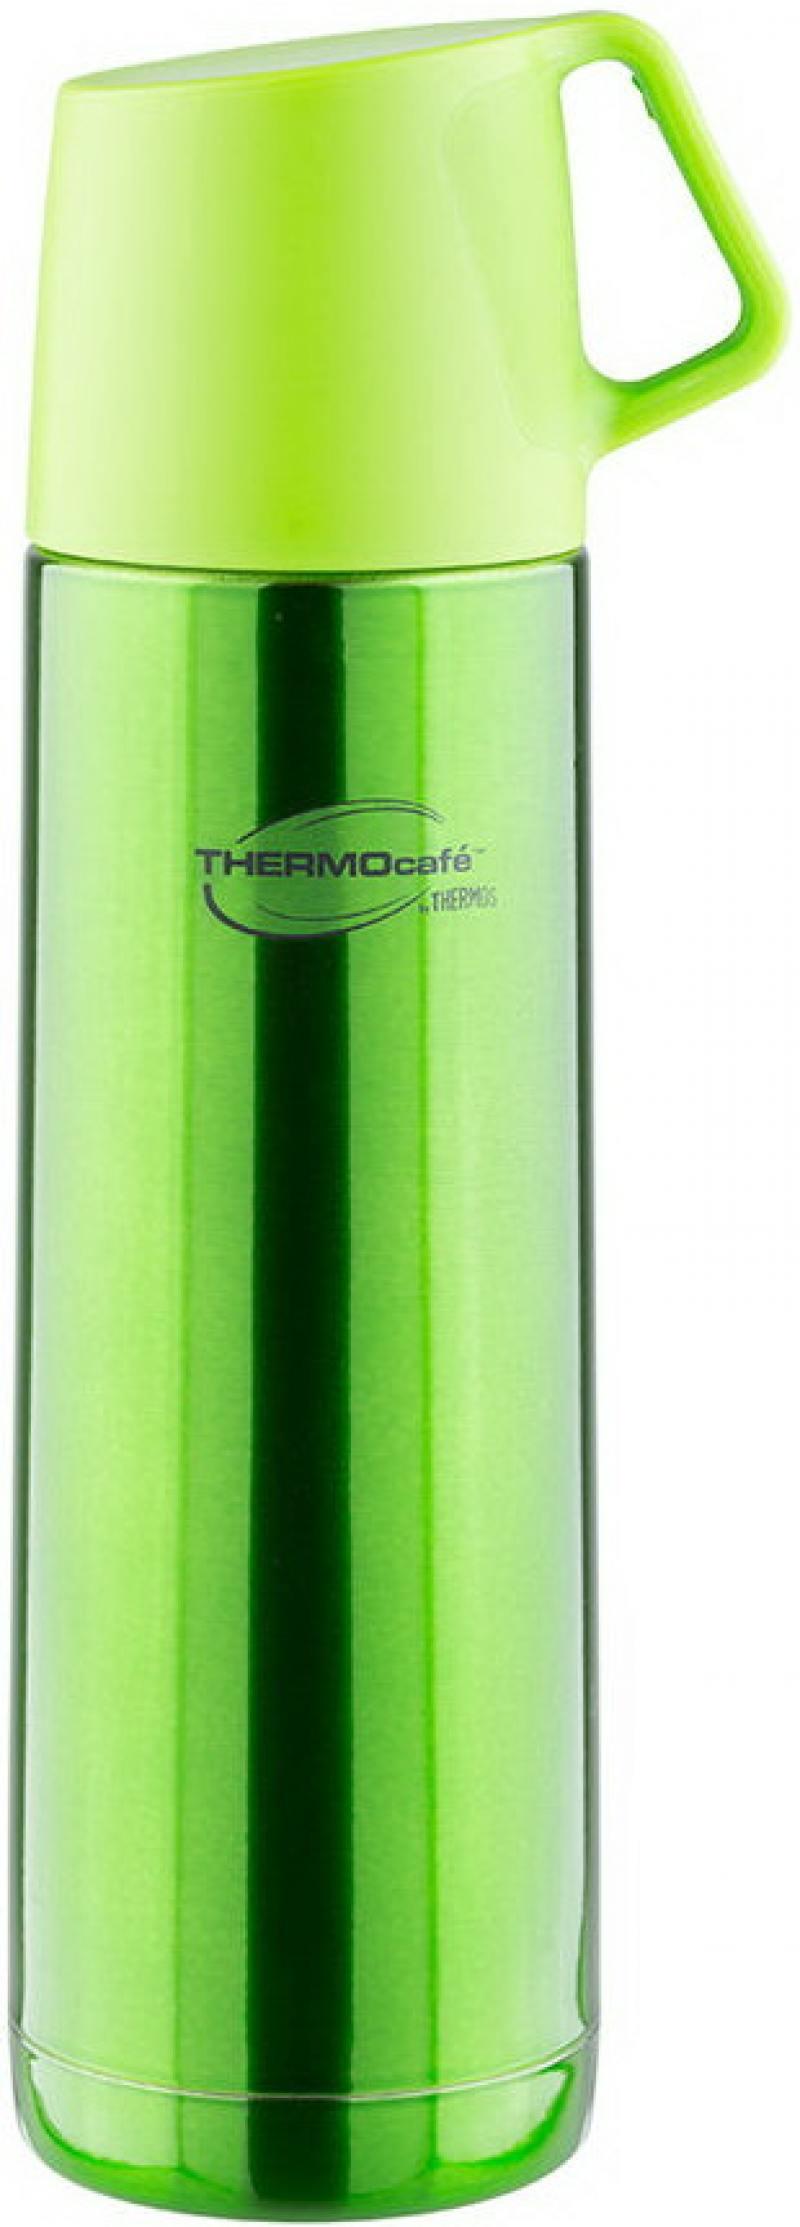 Термос Thermos THERMOcafe JF-50 0.5л салатовый 271501